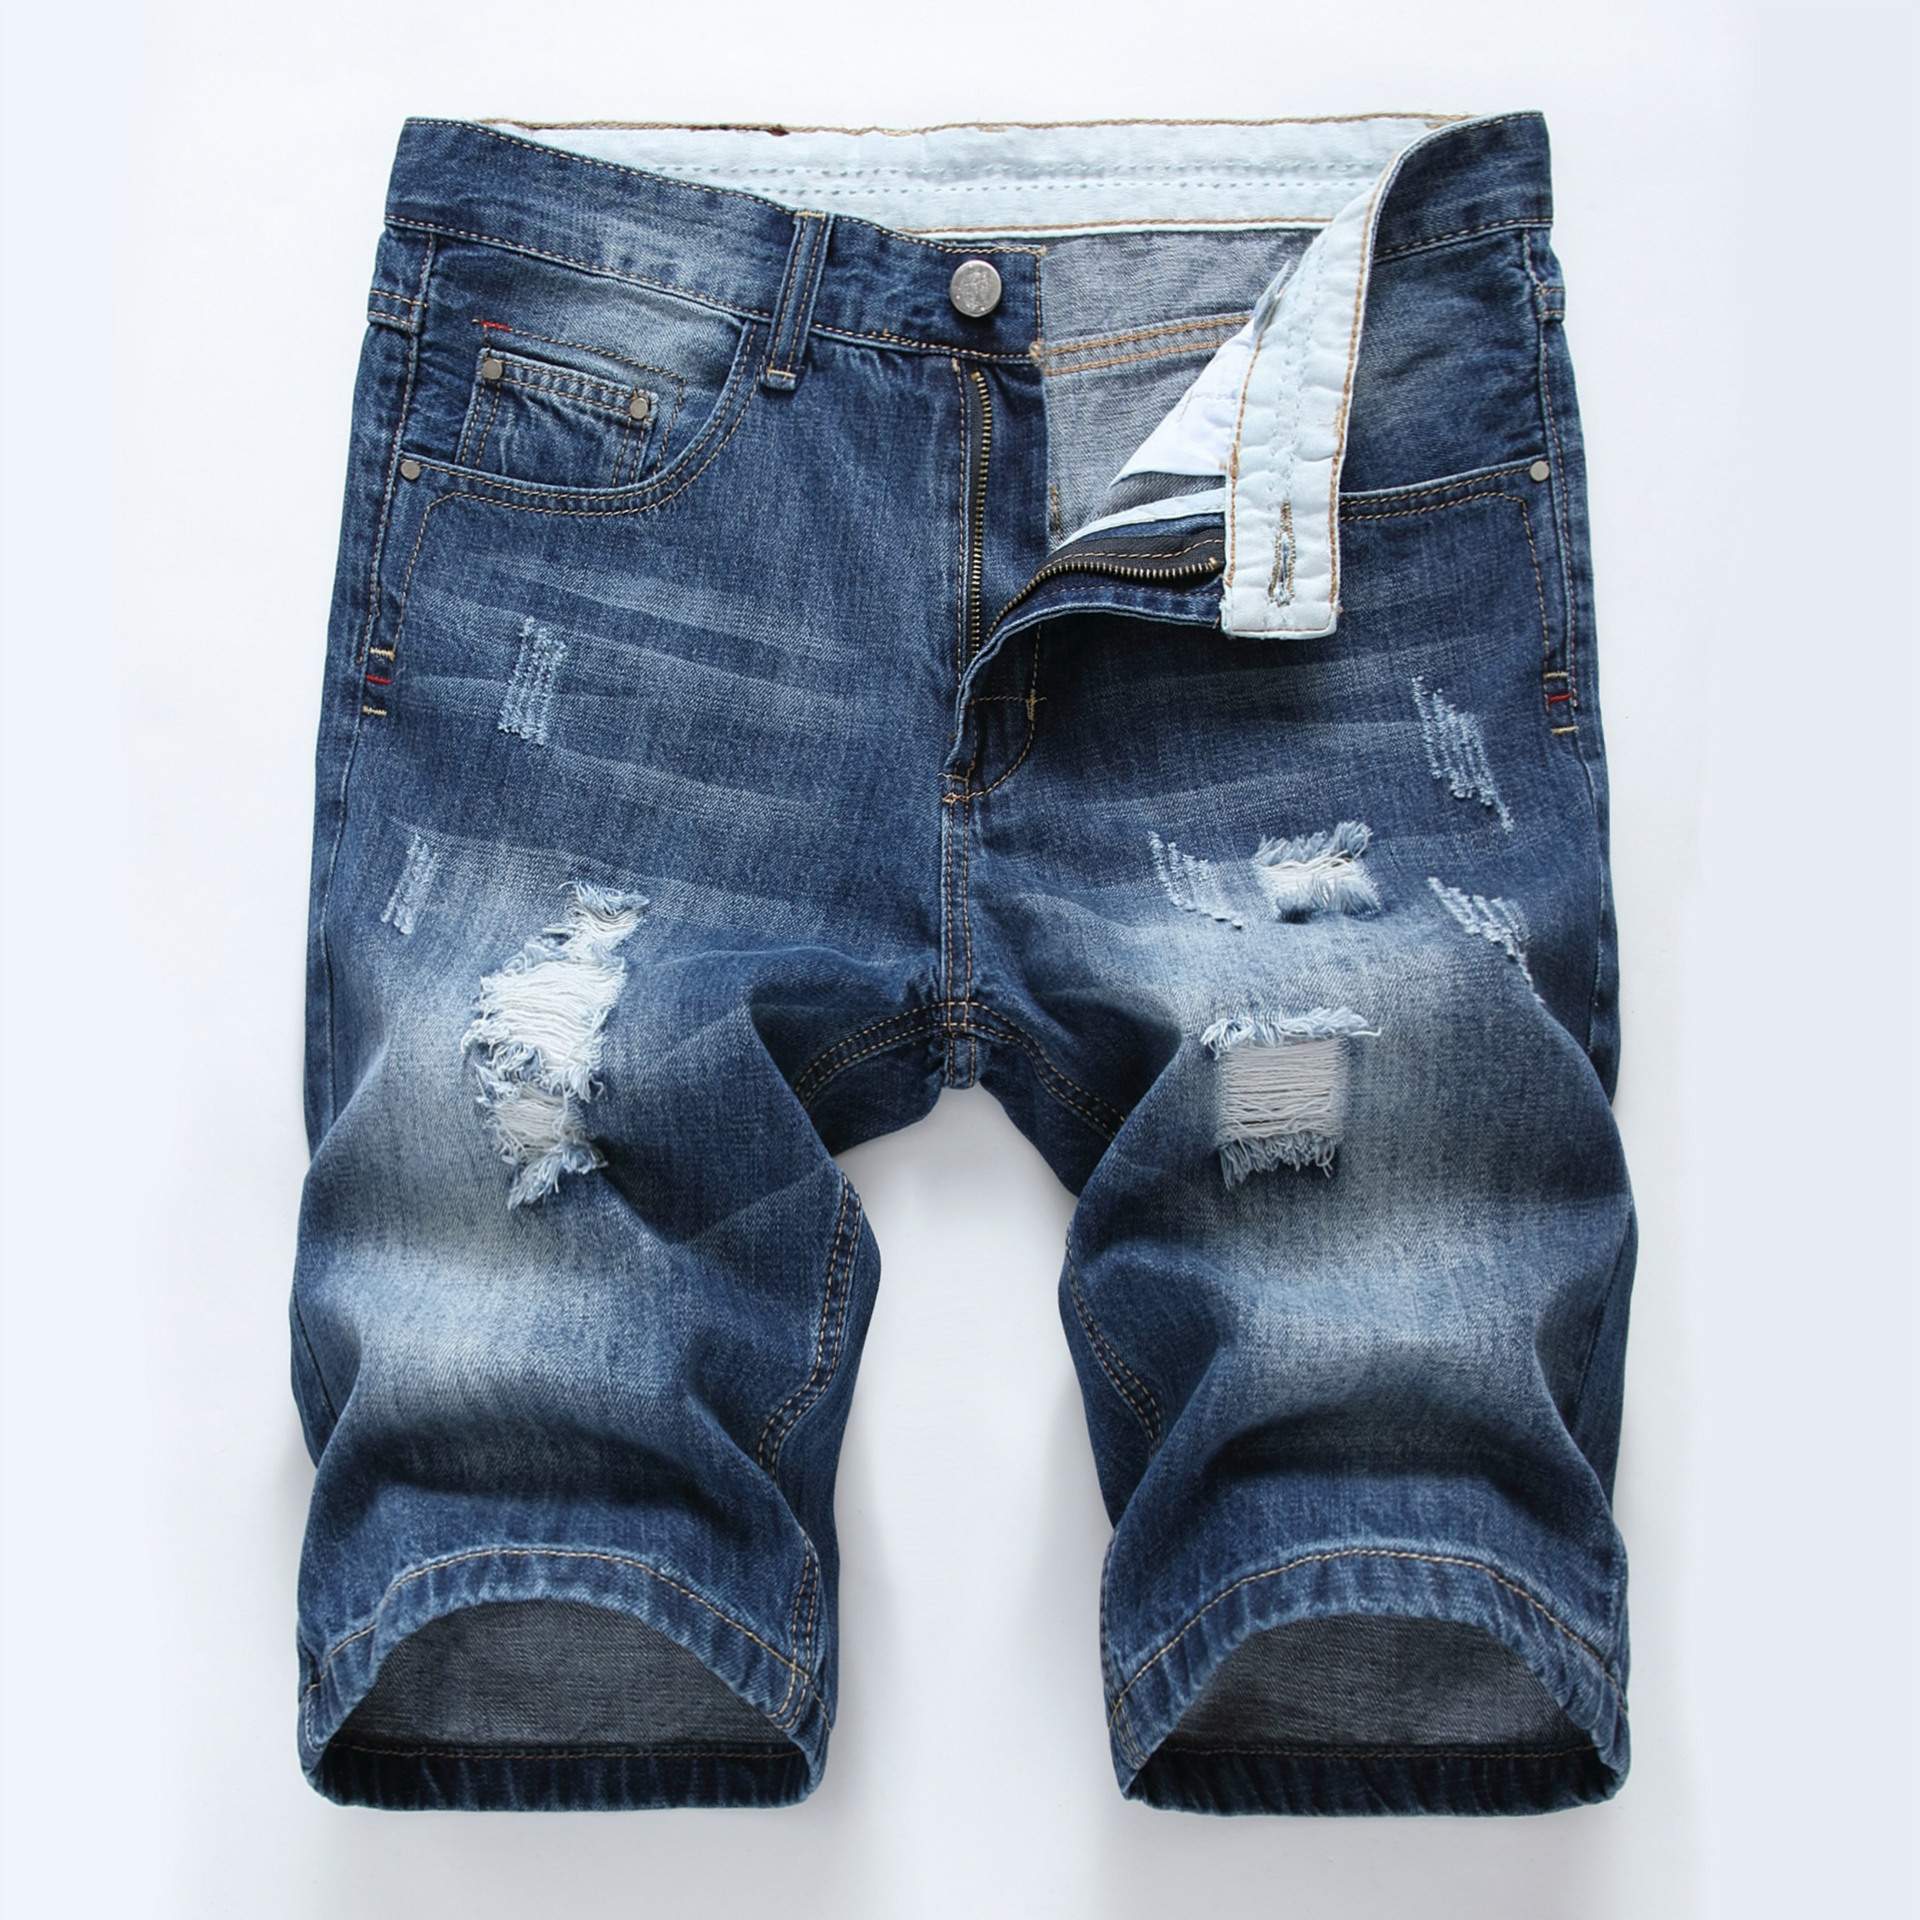 Mens Denim Shorts Men Jeans Mens Jean Shorts 2018 Summer Hole Hip Hop Bermuda Skate Board Harem Male Jogger Ankle Ripped Wave 42